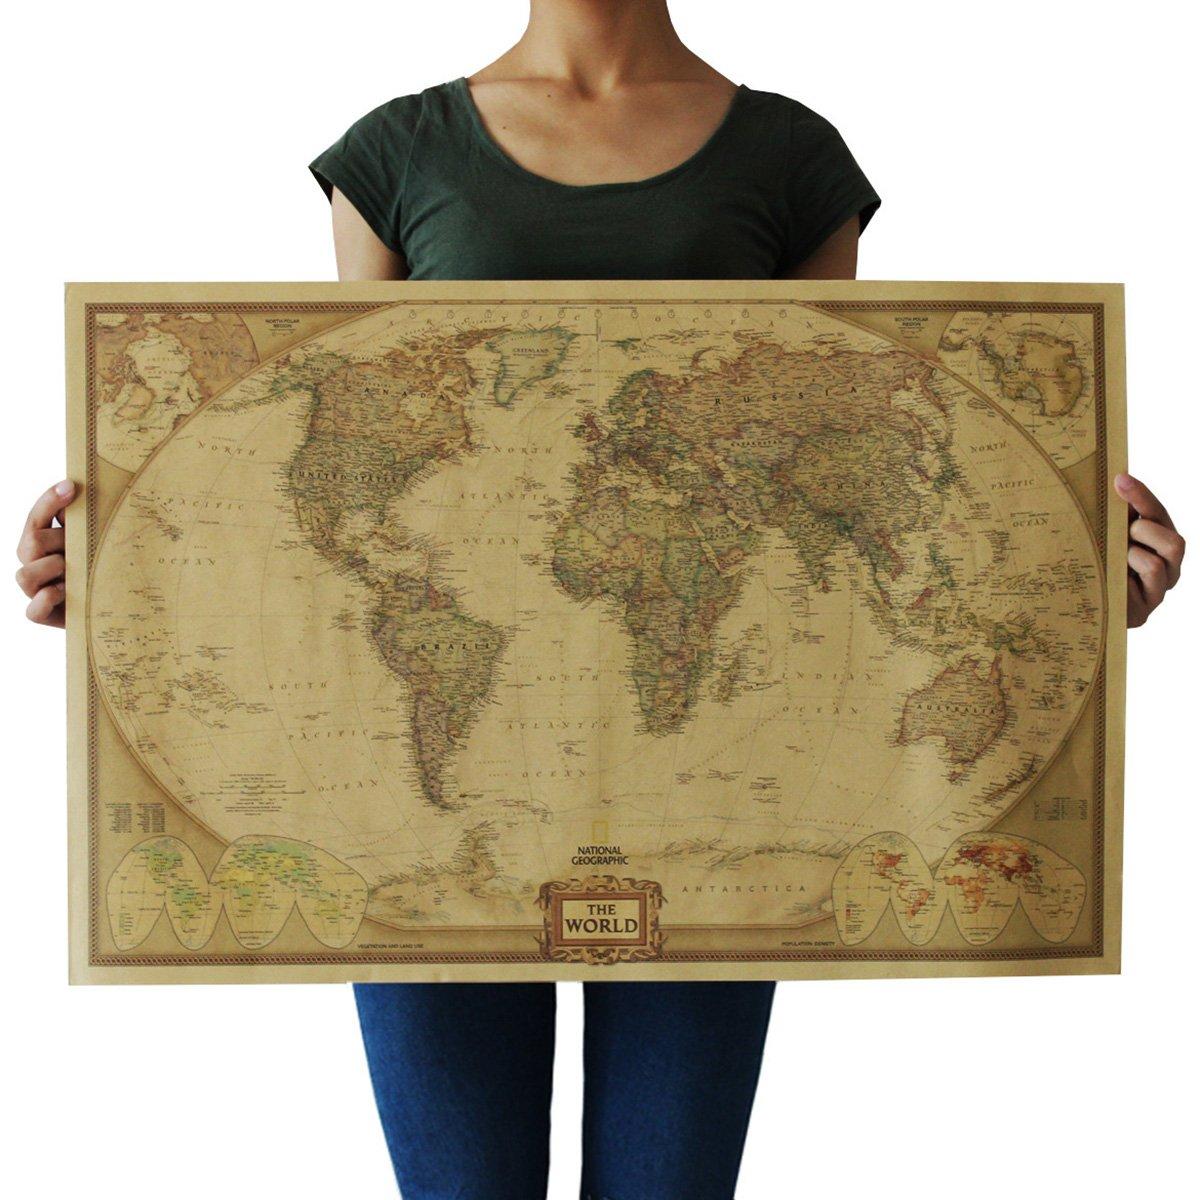 Souarts Cream Color Kraft Paper Rectangle Vintage World Map Decorative Poster Print Picture